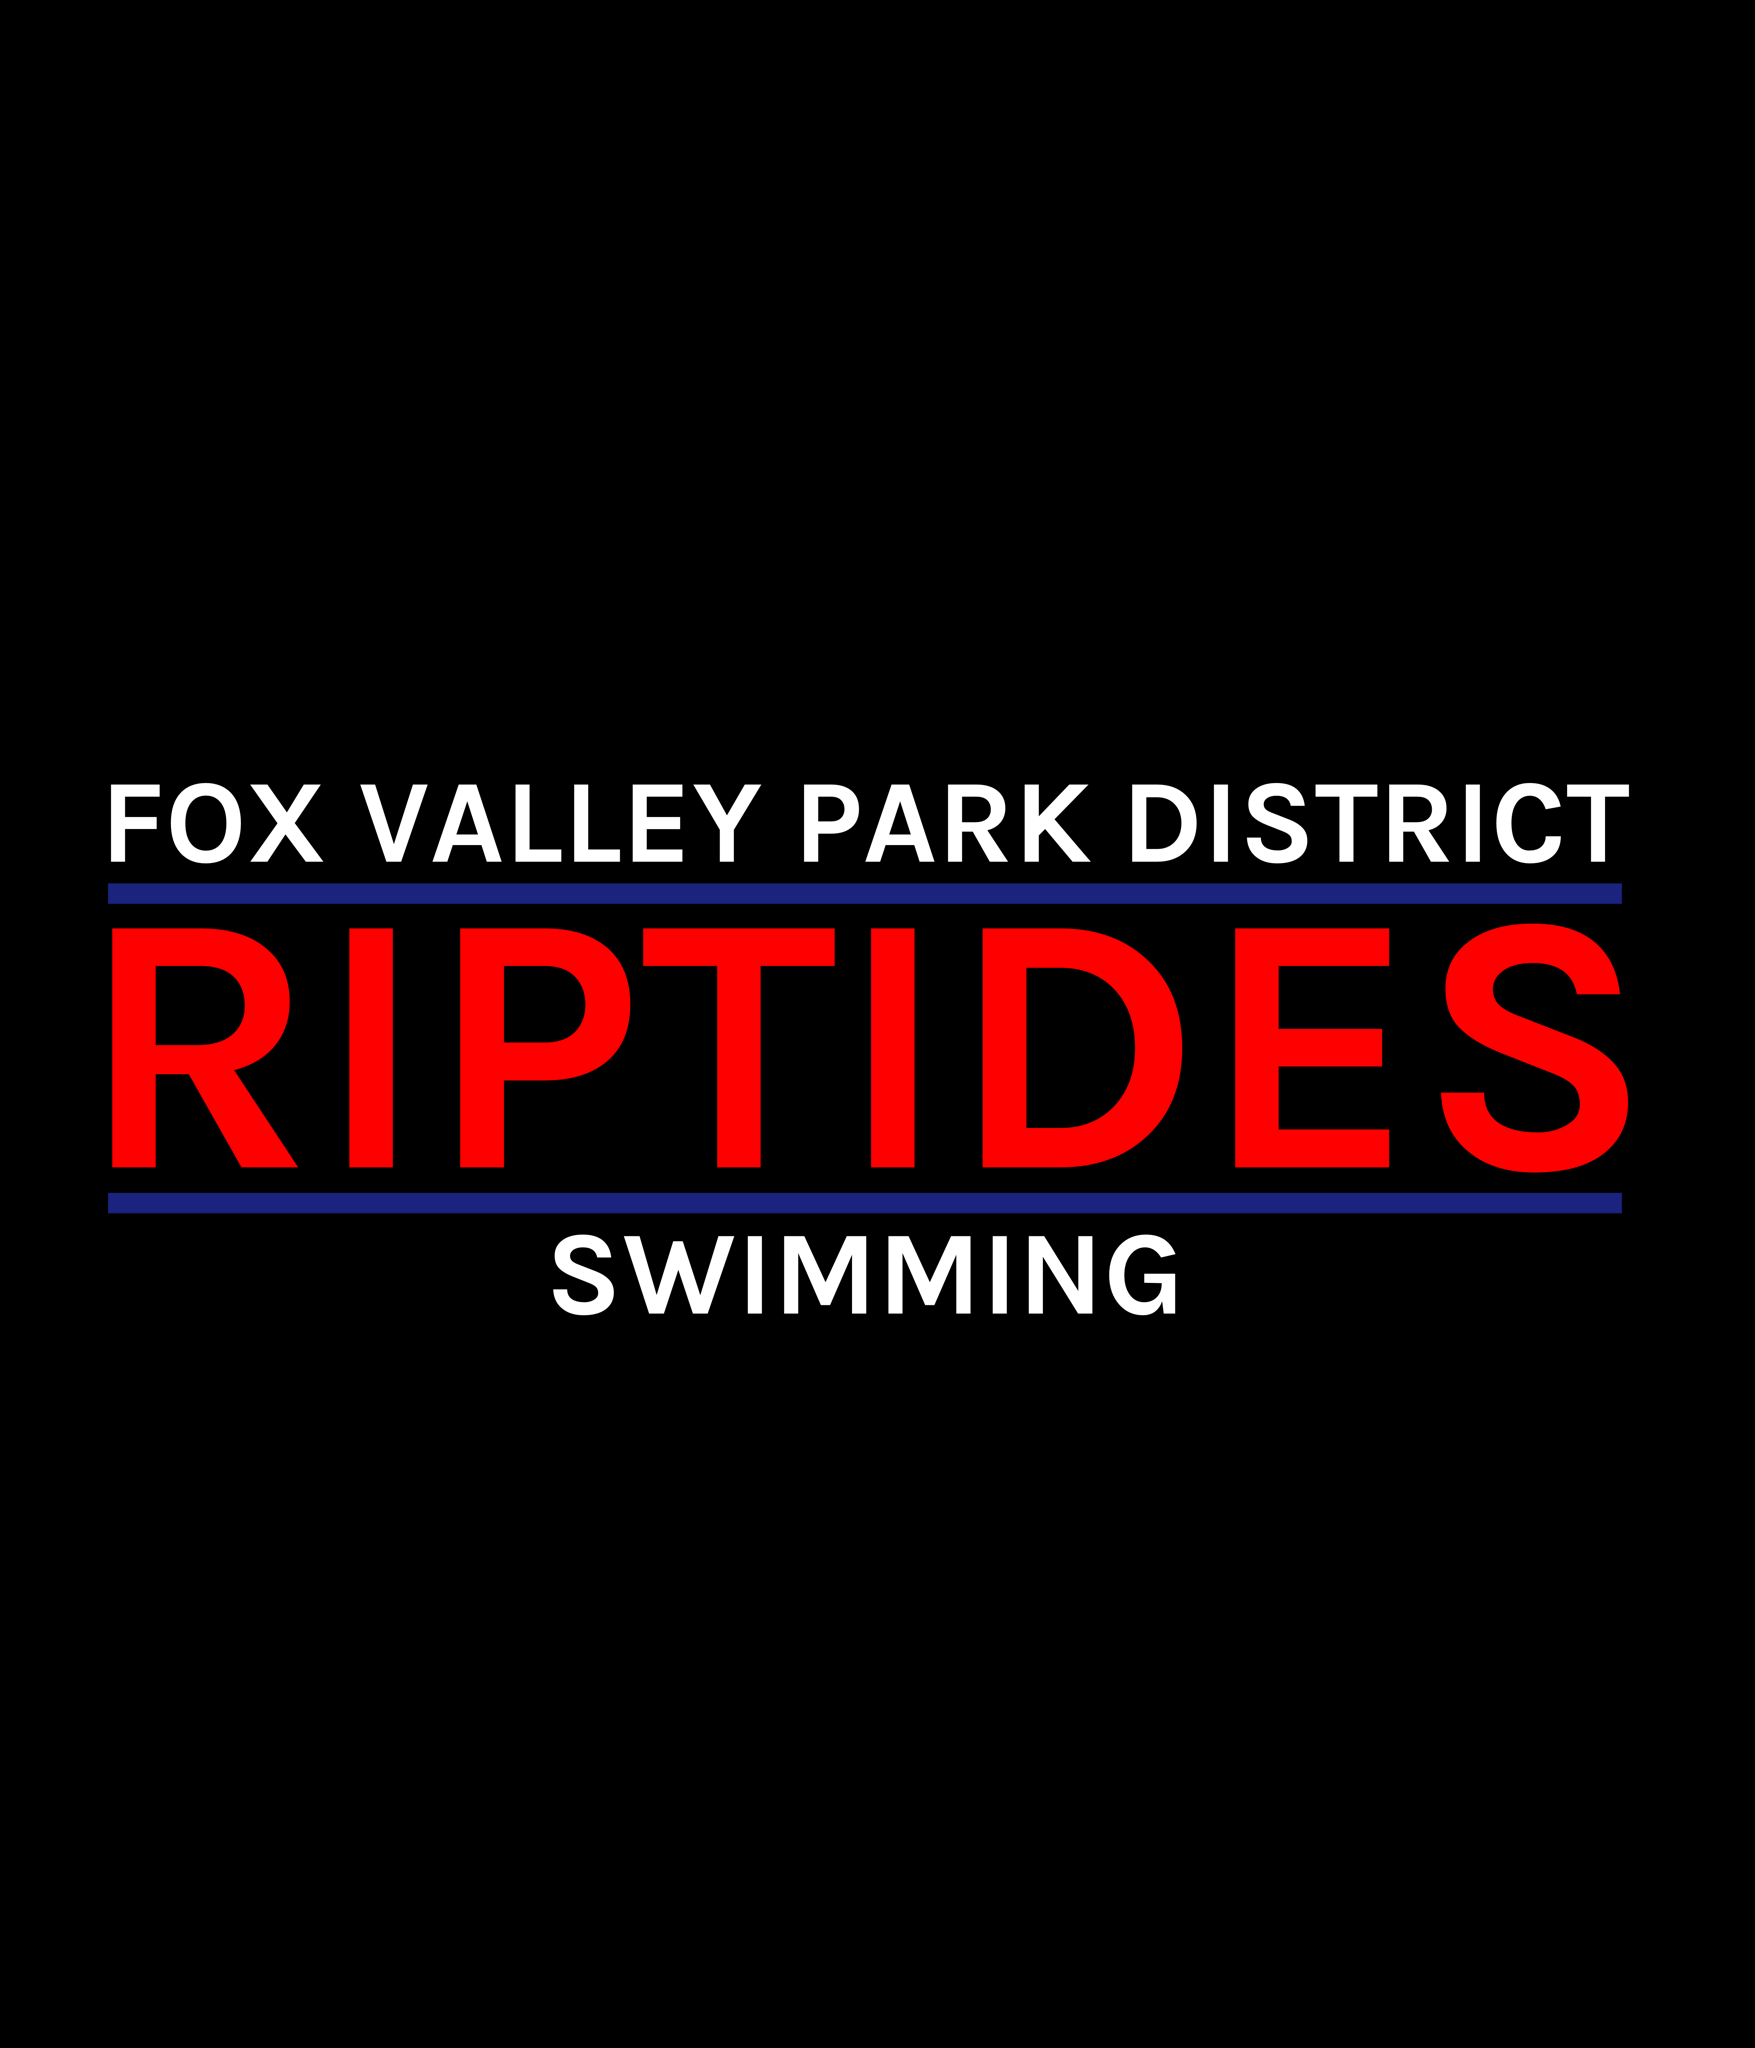 Fox Valley Park District Riptides logo